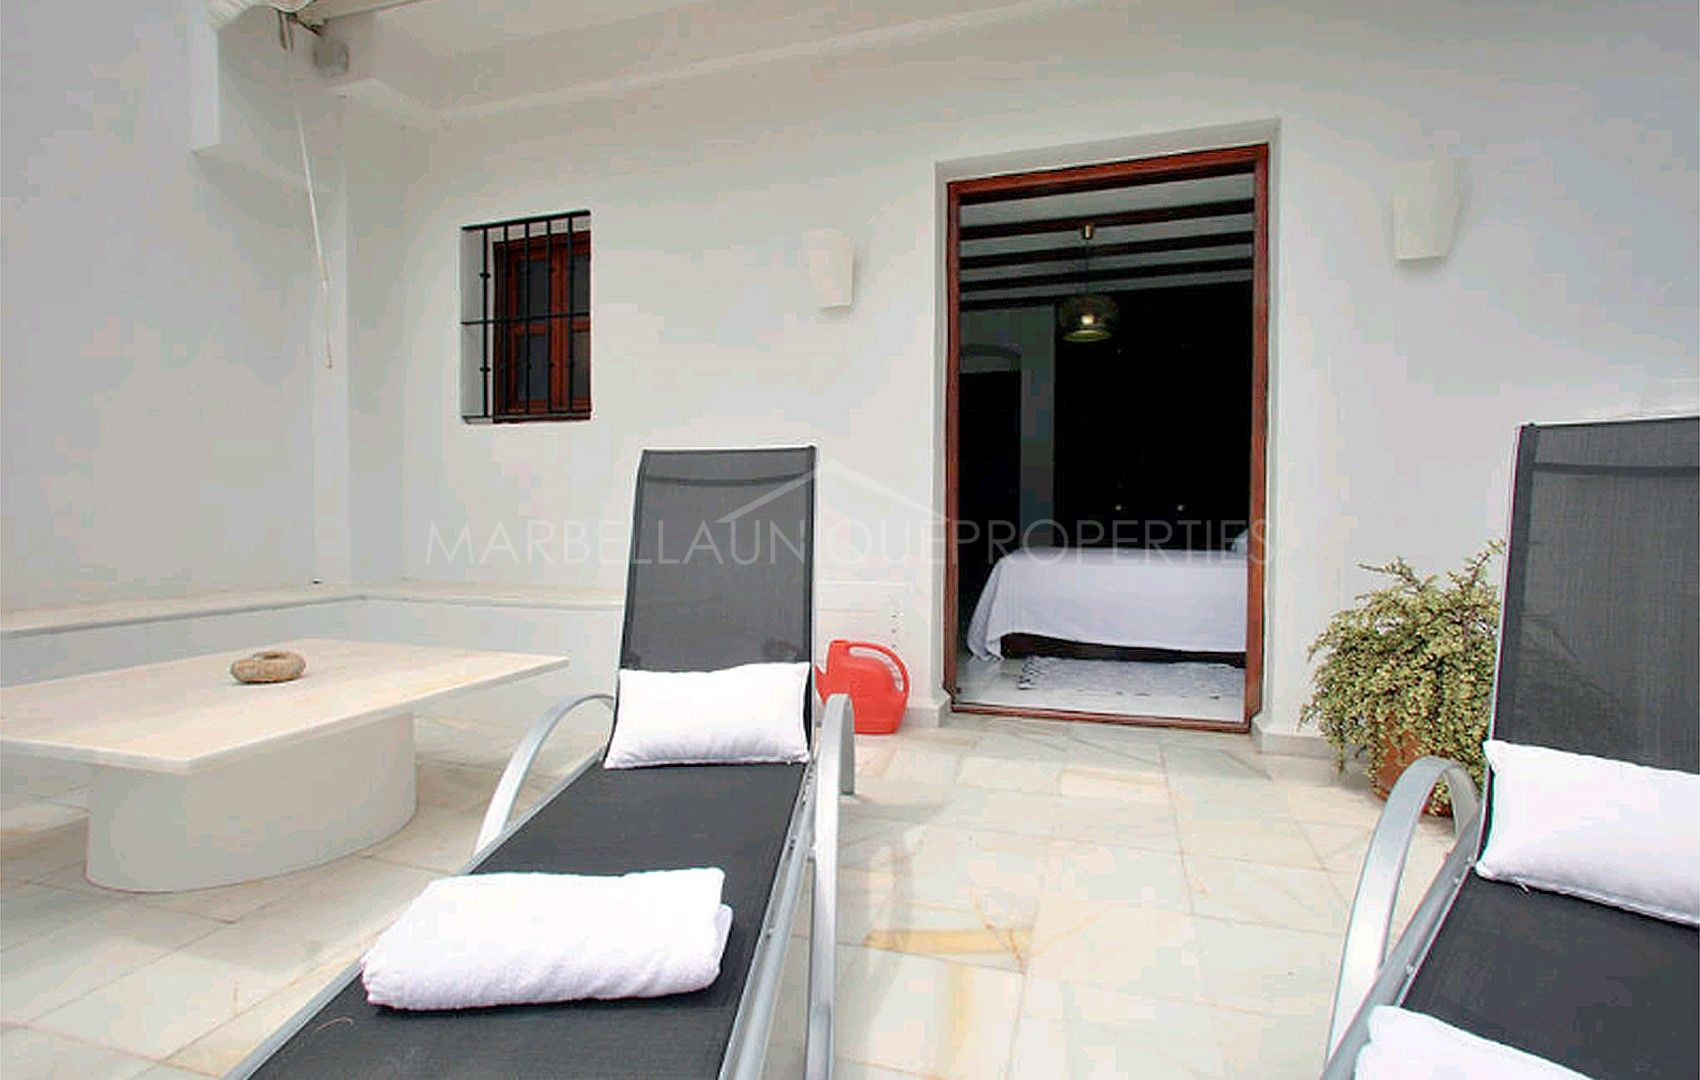 Great 4 bedroom refurbished townhouse in montepiedra marbella